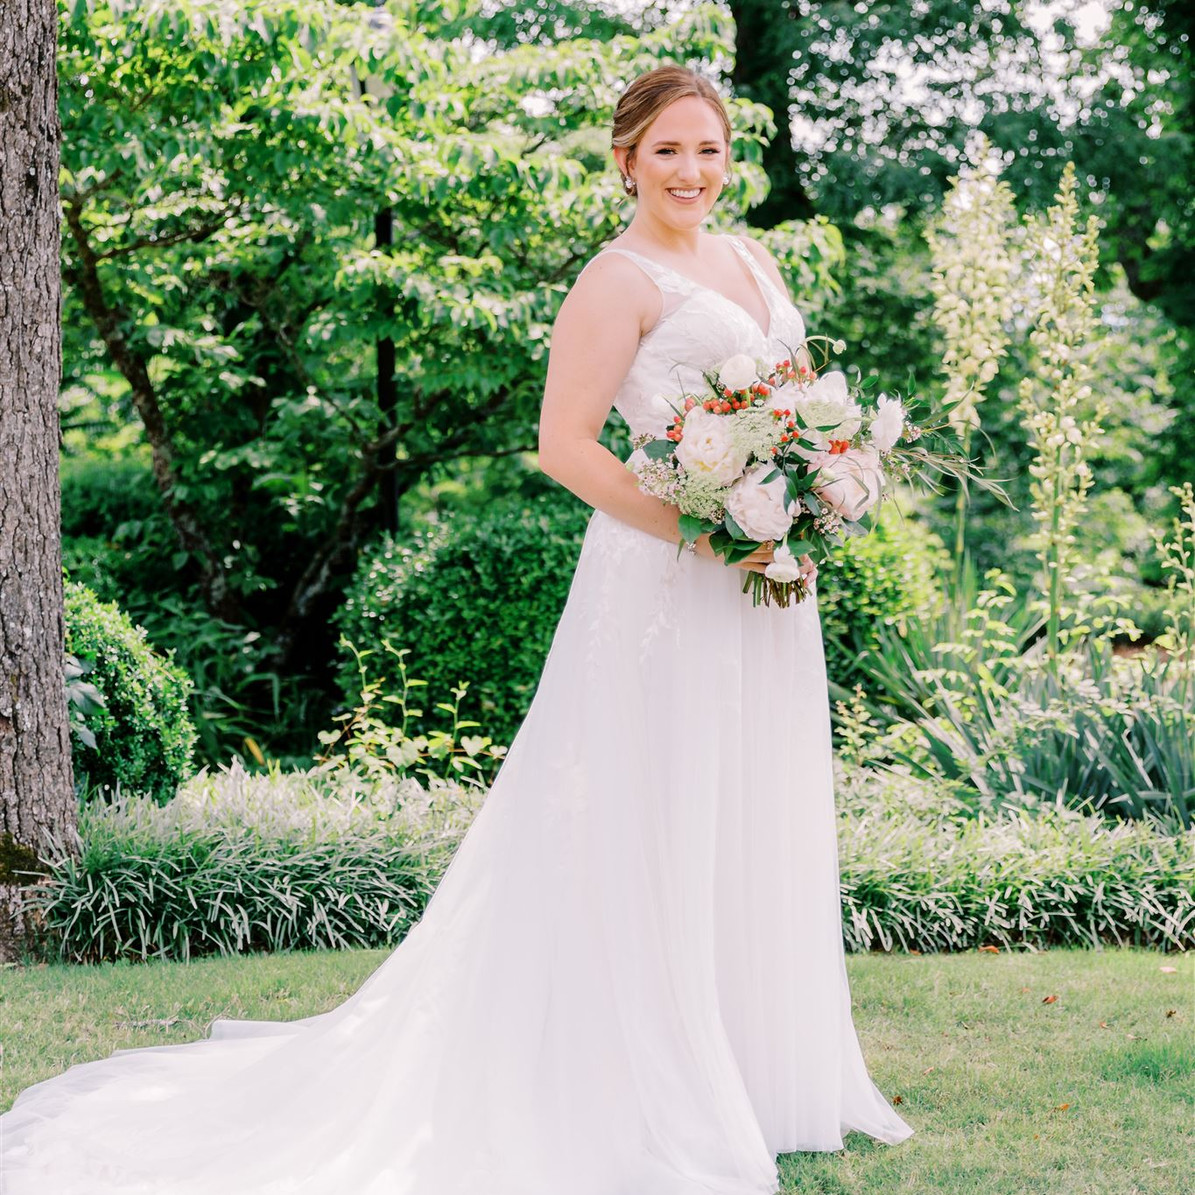 AisPortraits-Kate-Mitch-Wedding-88_websize.jpg